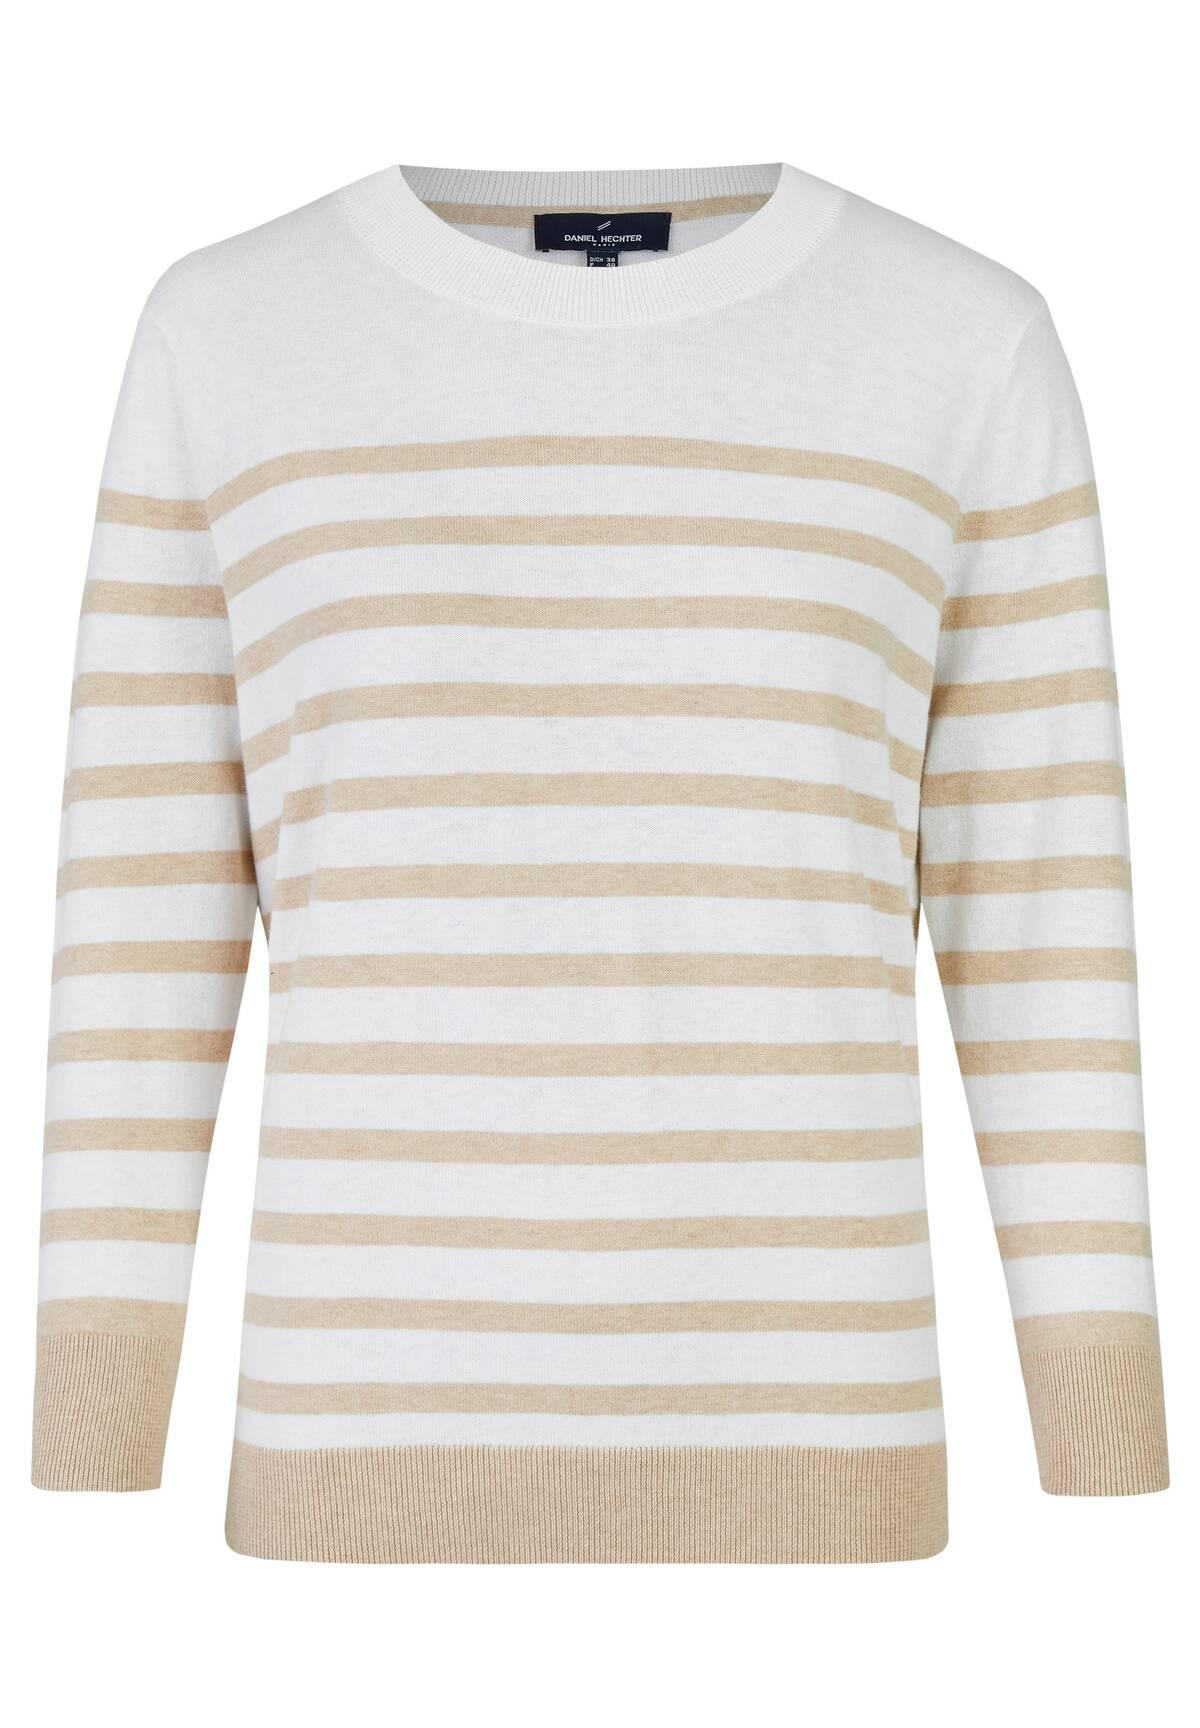 T-shirt marin en coton rayé /